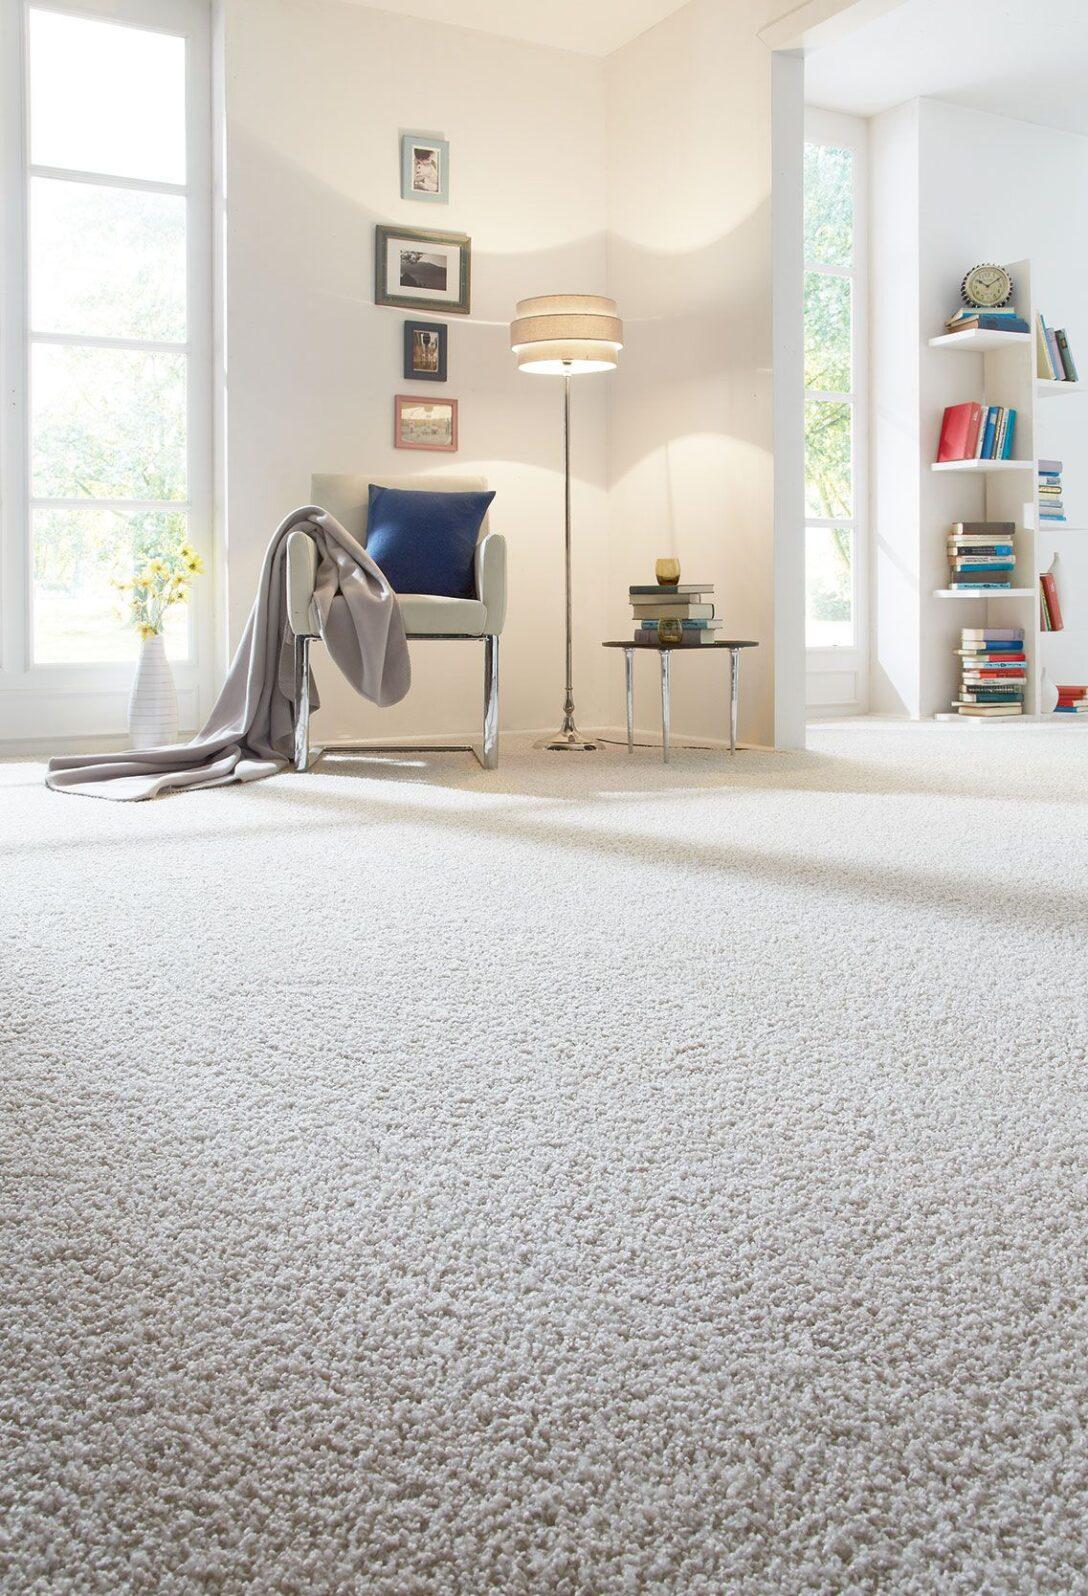 Large Size of Teppichboden Fr Allergiker Besonders Gut Geeignet Teppich Regal Kinderzimmer Weiß Regale Sofa Kinderzimmer Teppichboden Kinderzimmer